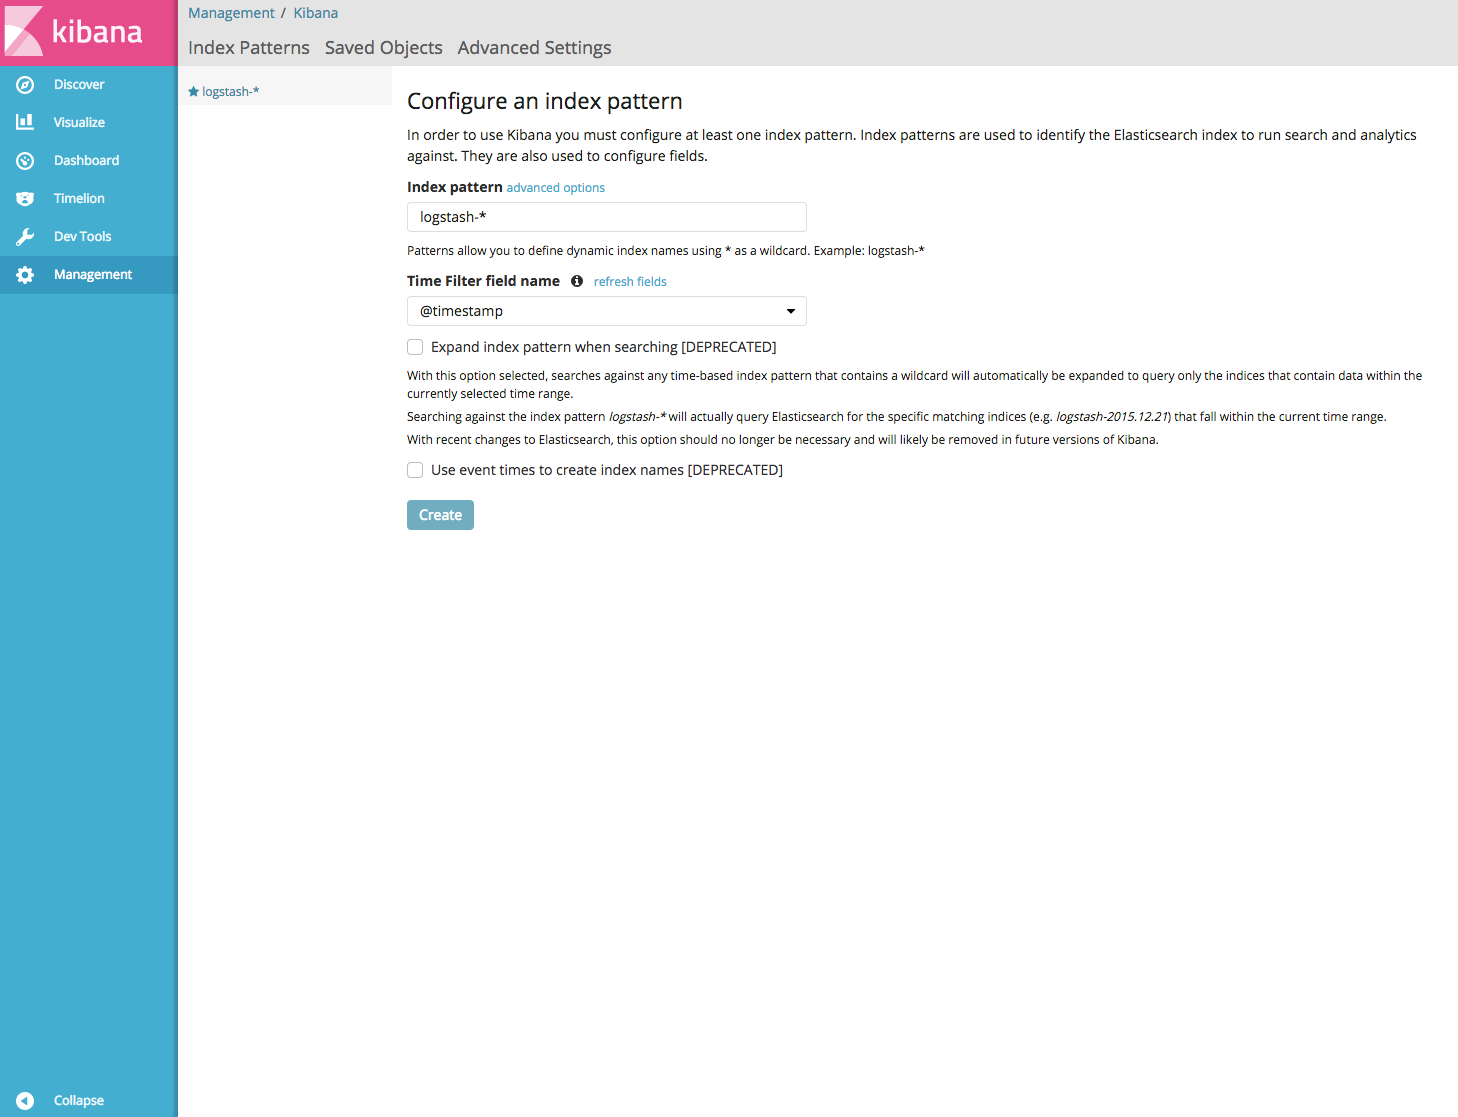 pf (Firewall logs) + Elasticsearch + Logstash + Kibana